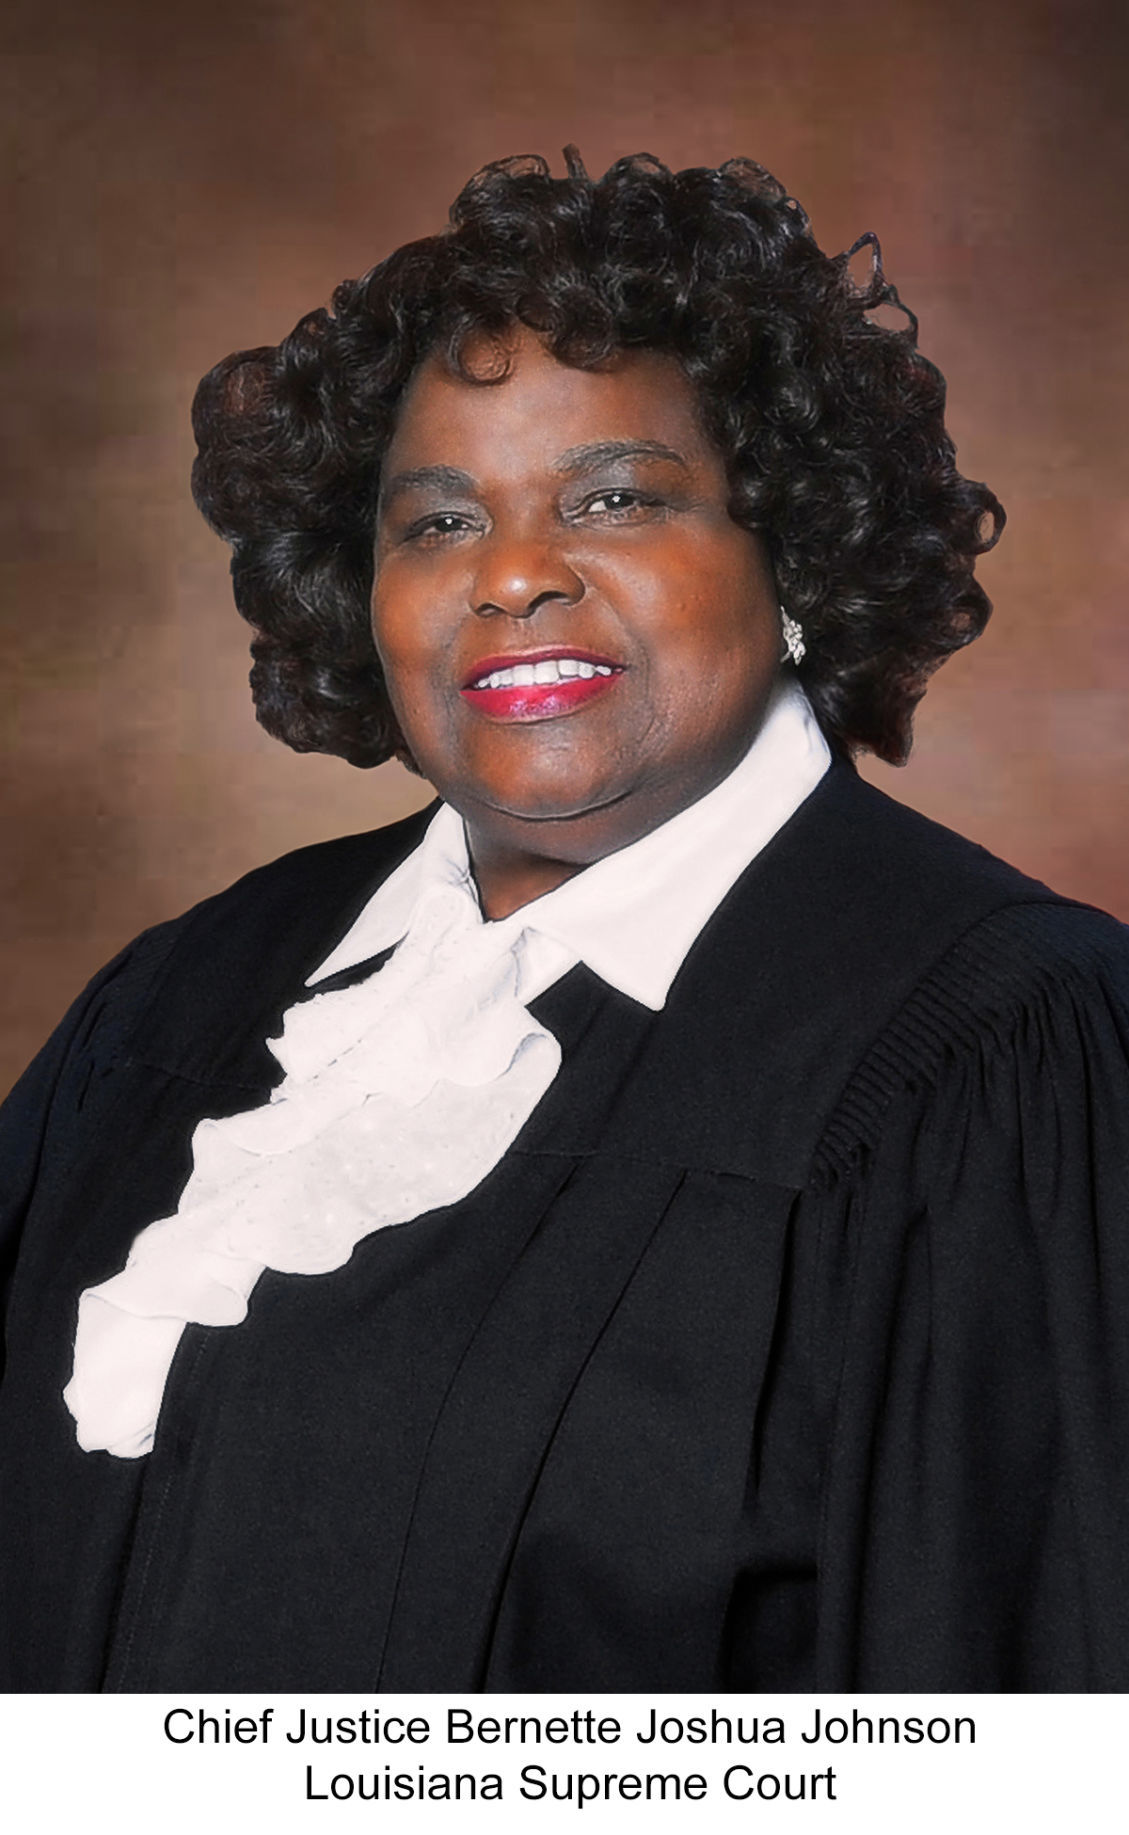 Chief Justice Johnson portrait 4x6_with caption.jpg